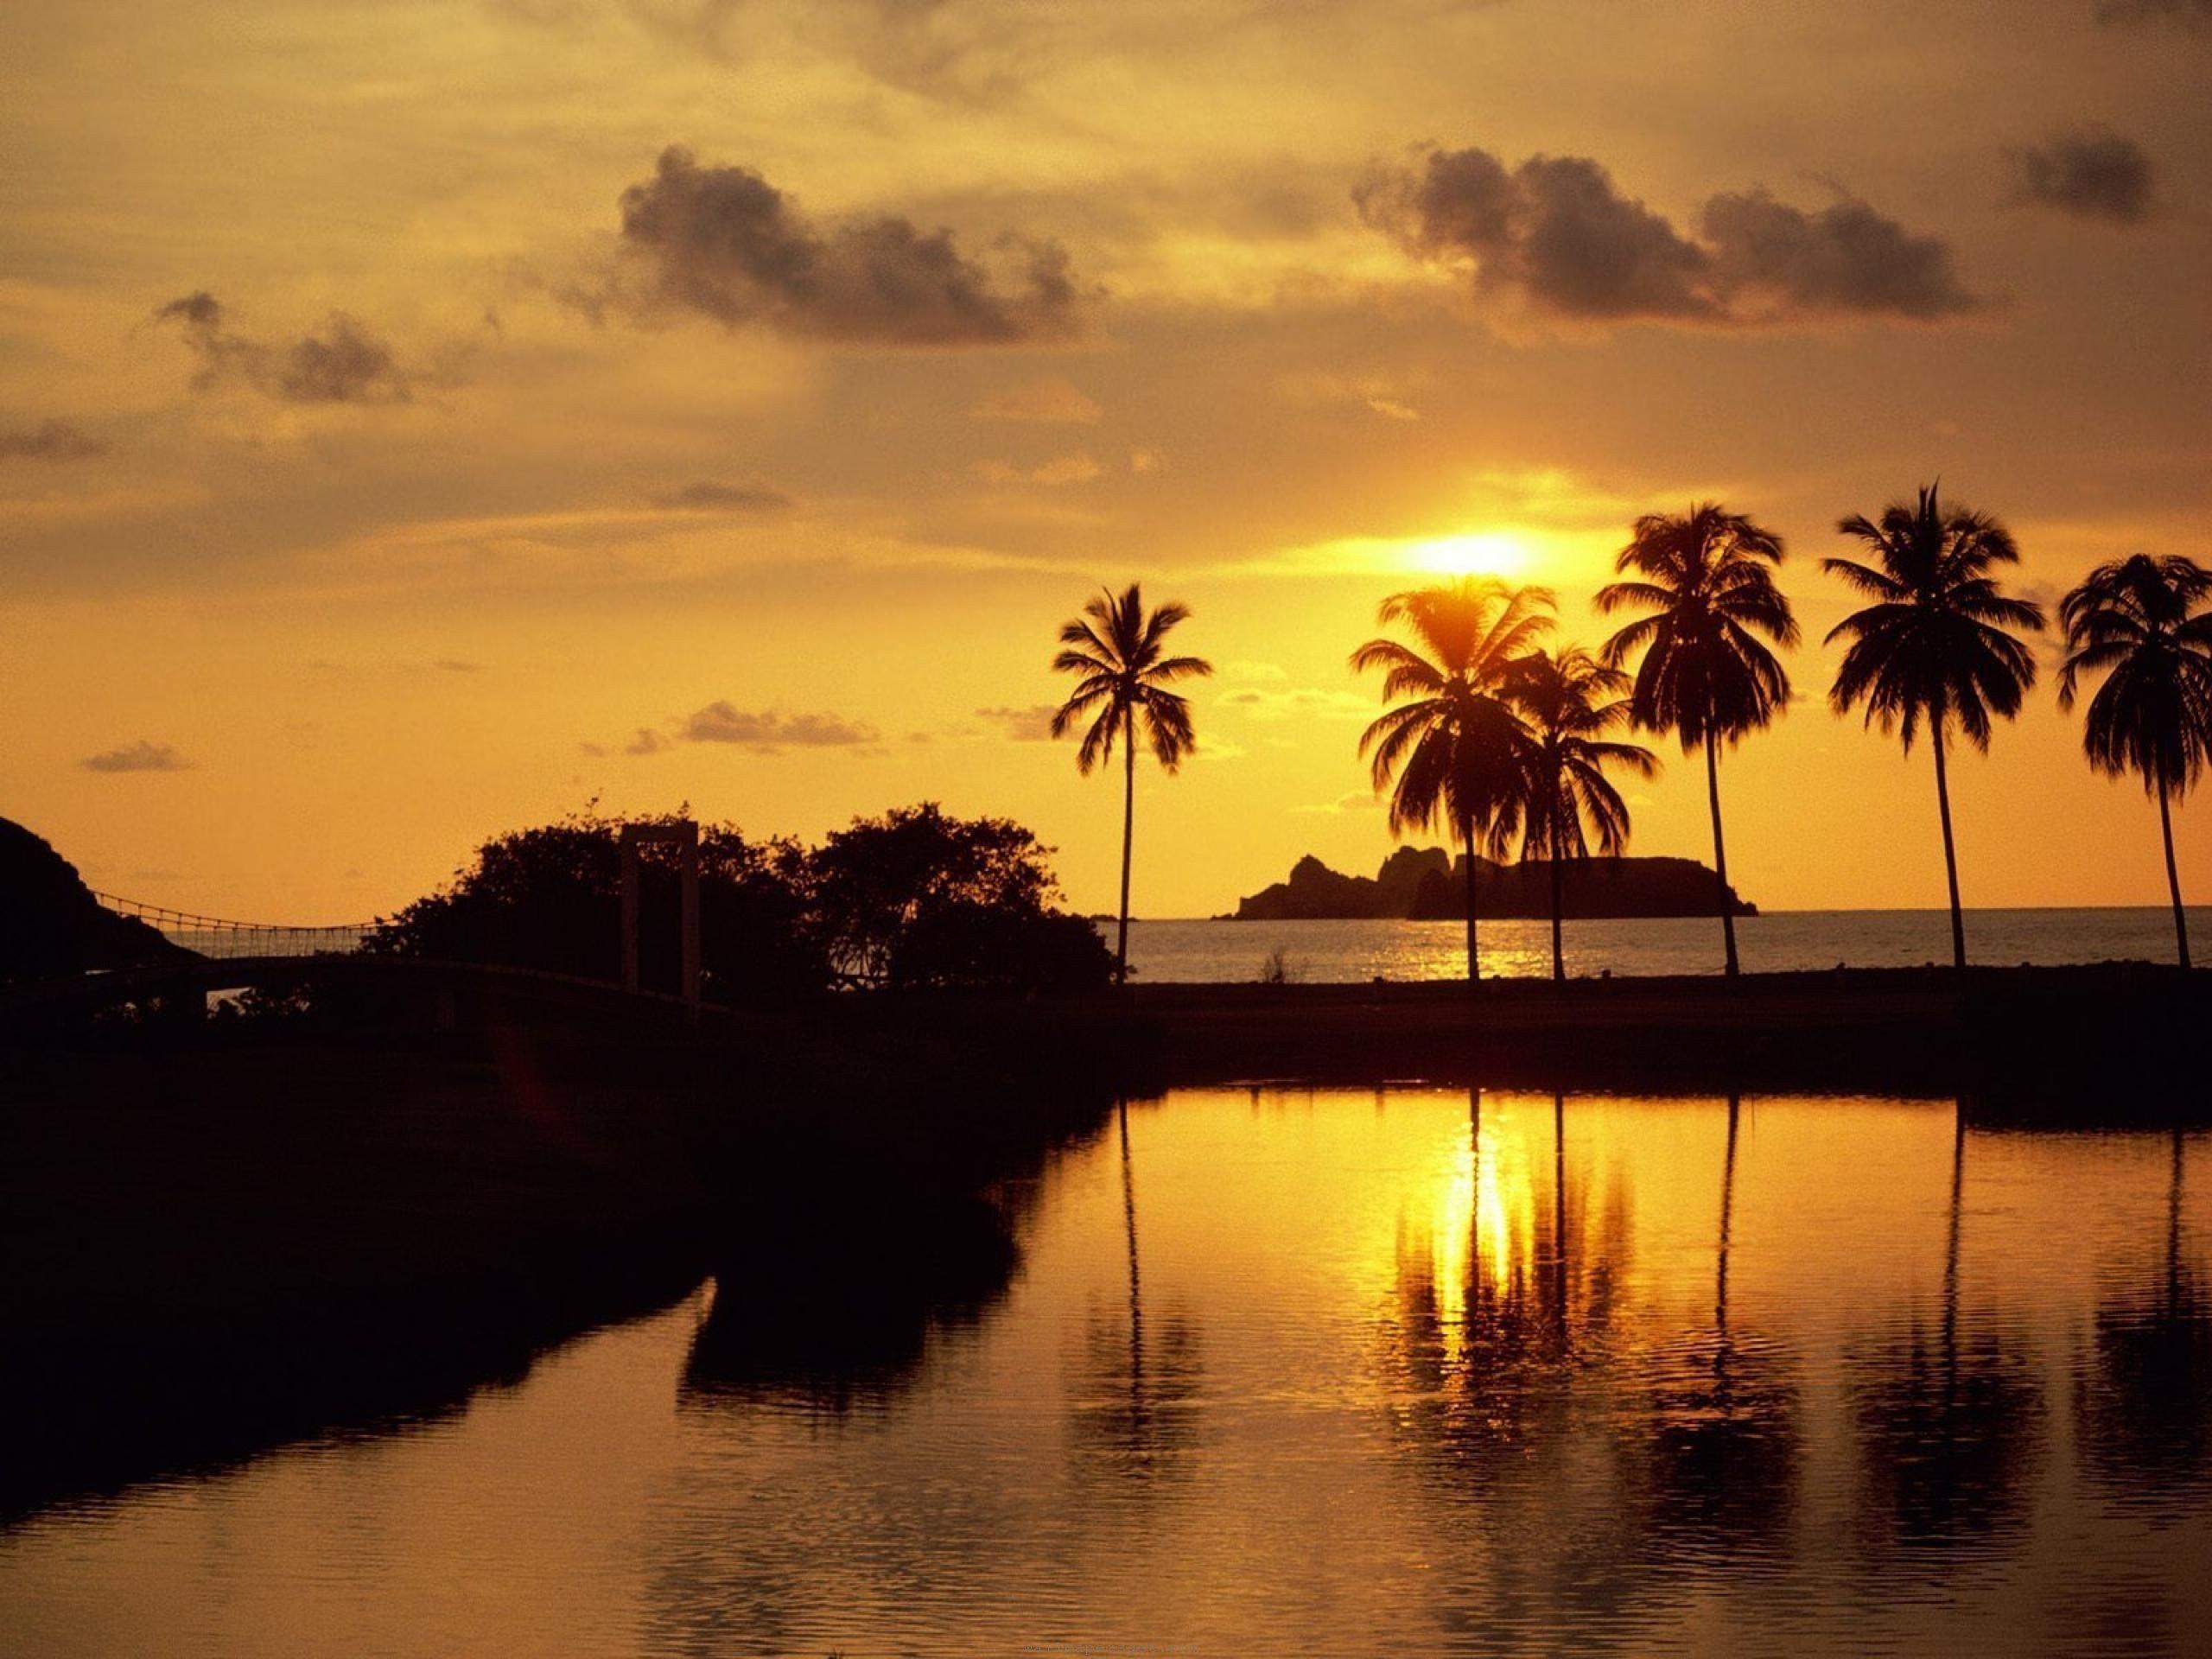 16 Luxury Pubg Wallpaper Iphone 6: Sunset Sunrise Mexico Palm Trees Resort North America